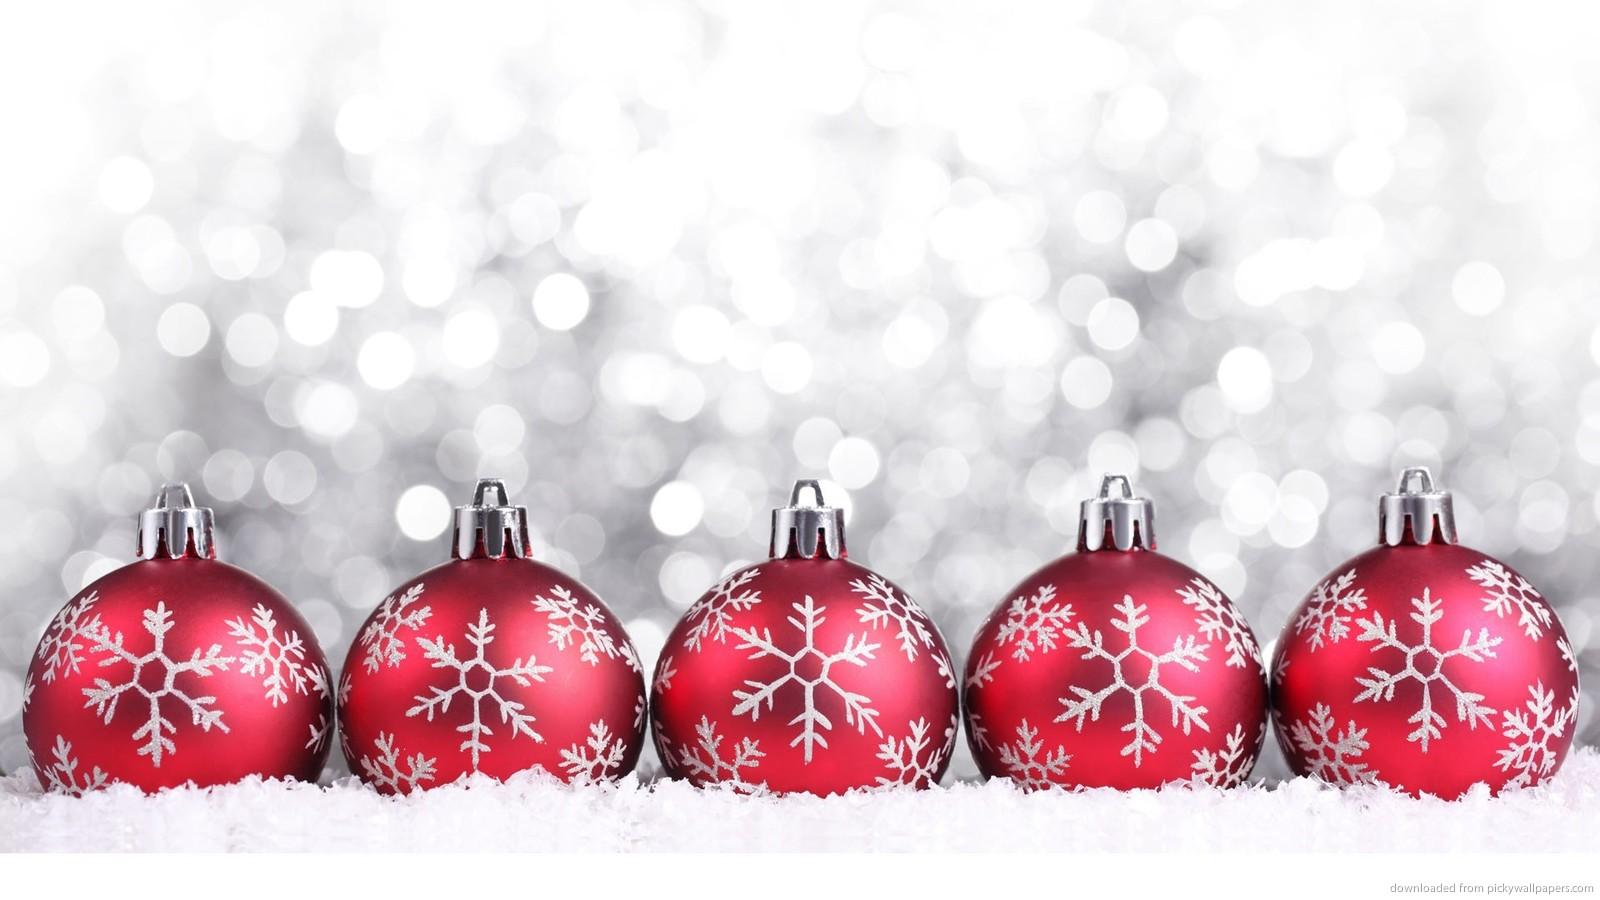 Christmas Snowflakes - Wallpaper, Gallery 520643507